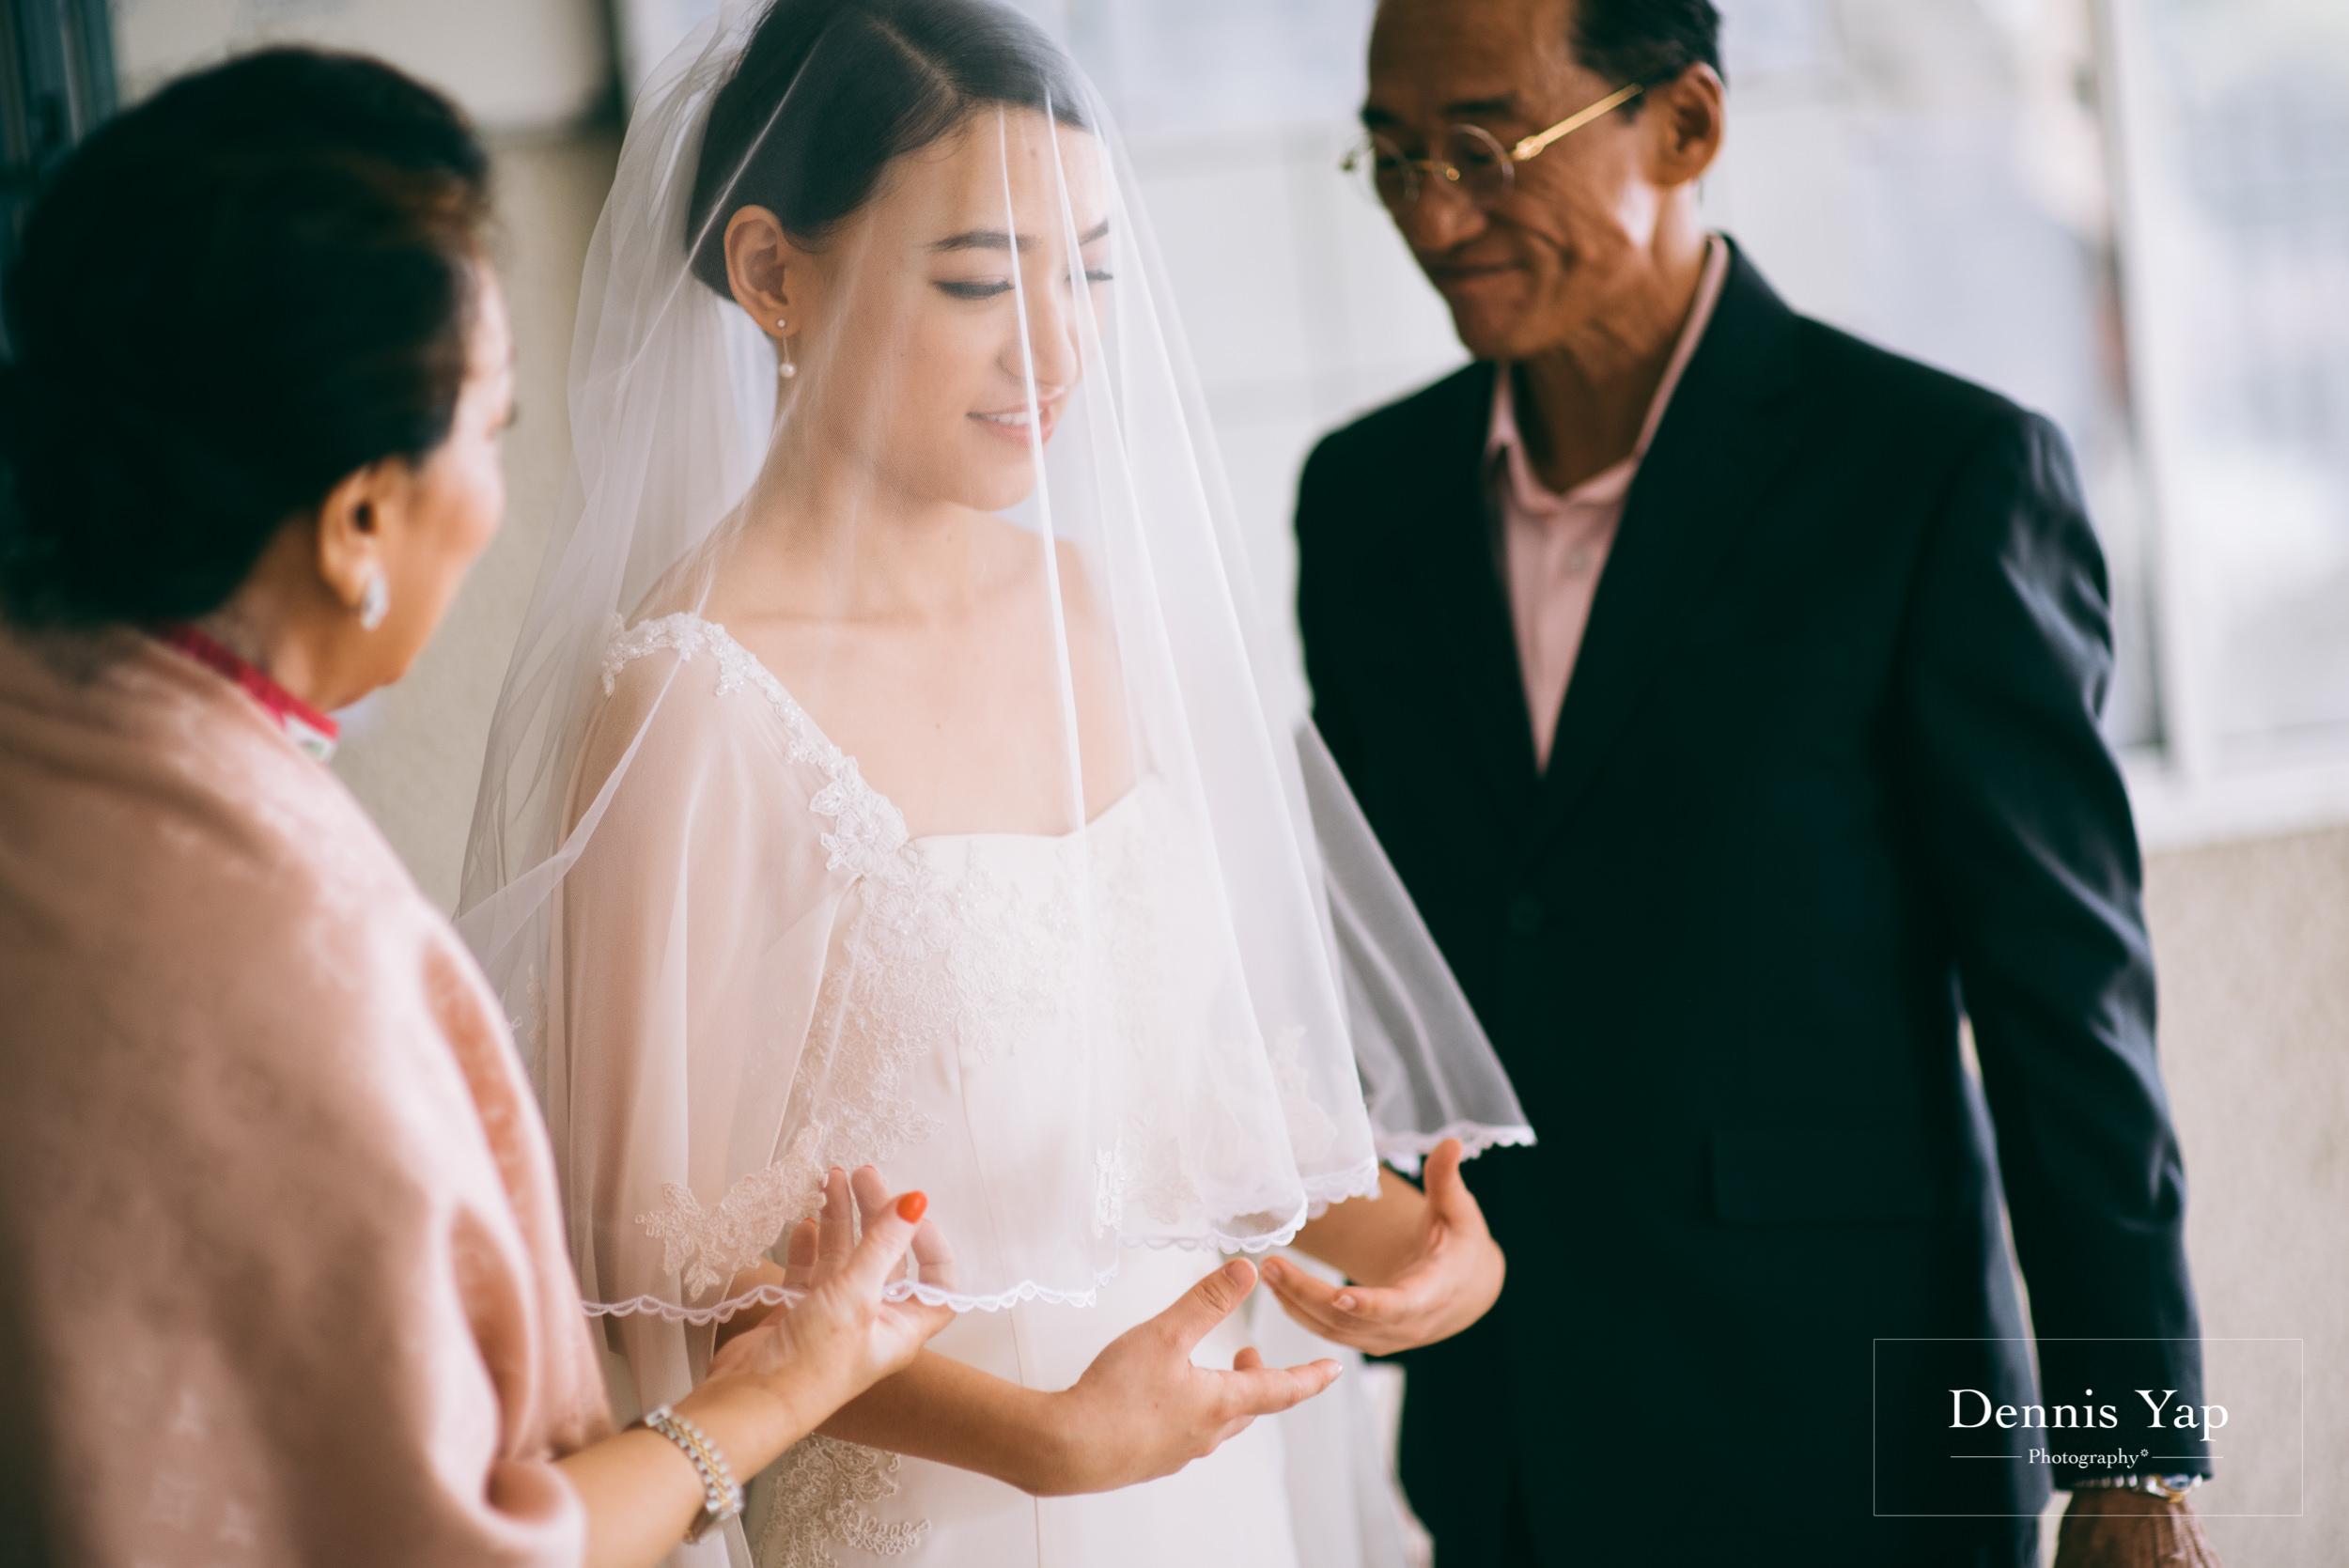 sandro kitty wedding day majestic hotel kuala lumpur dennis yap photography malaysia top wedding photographer-13.jpg